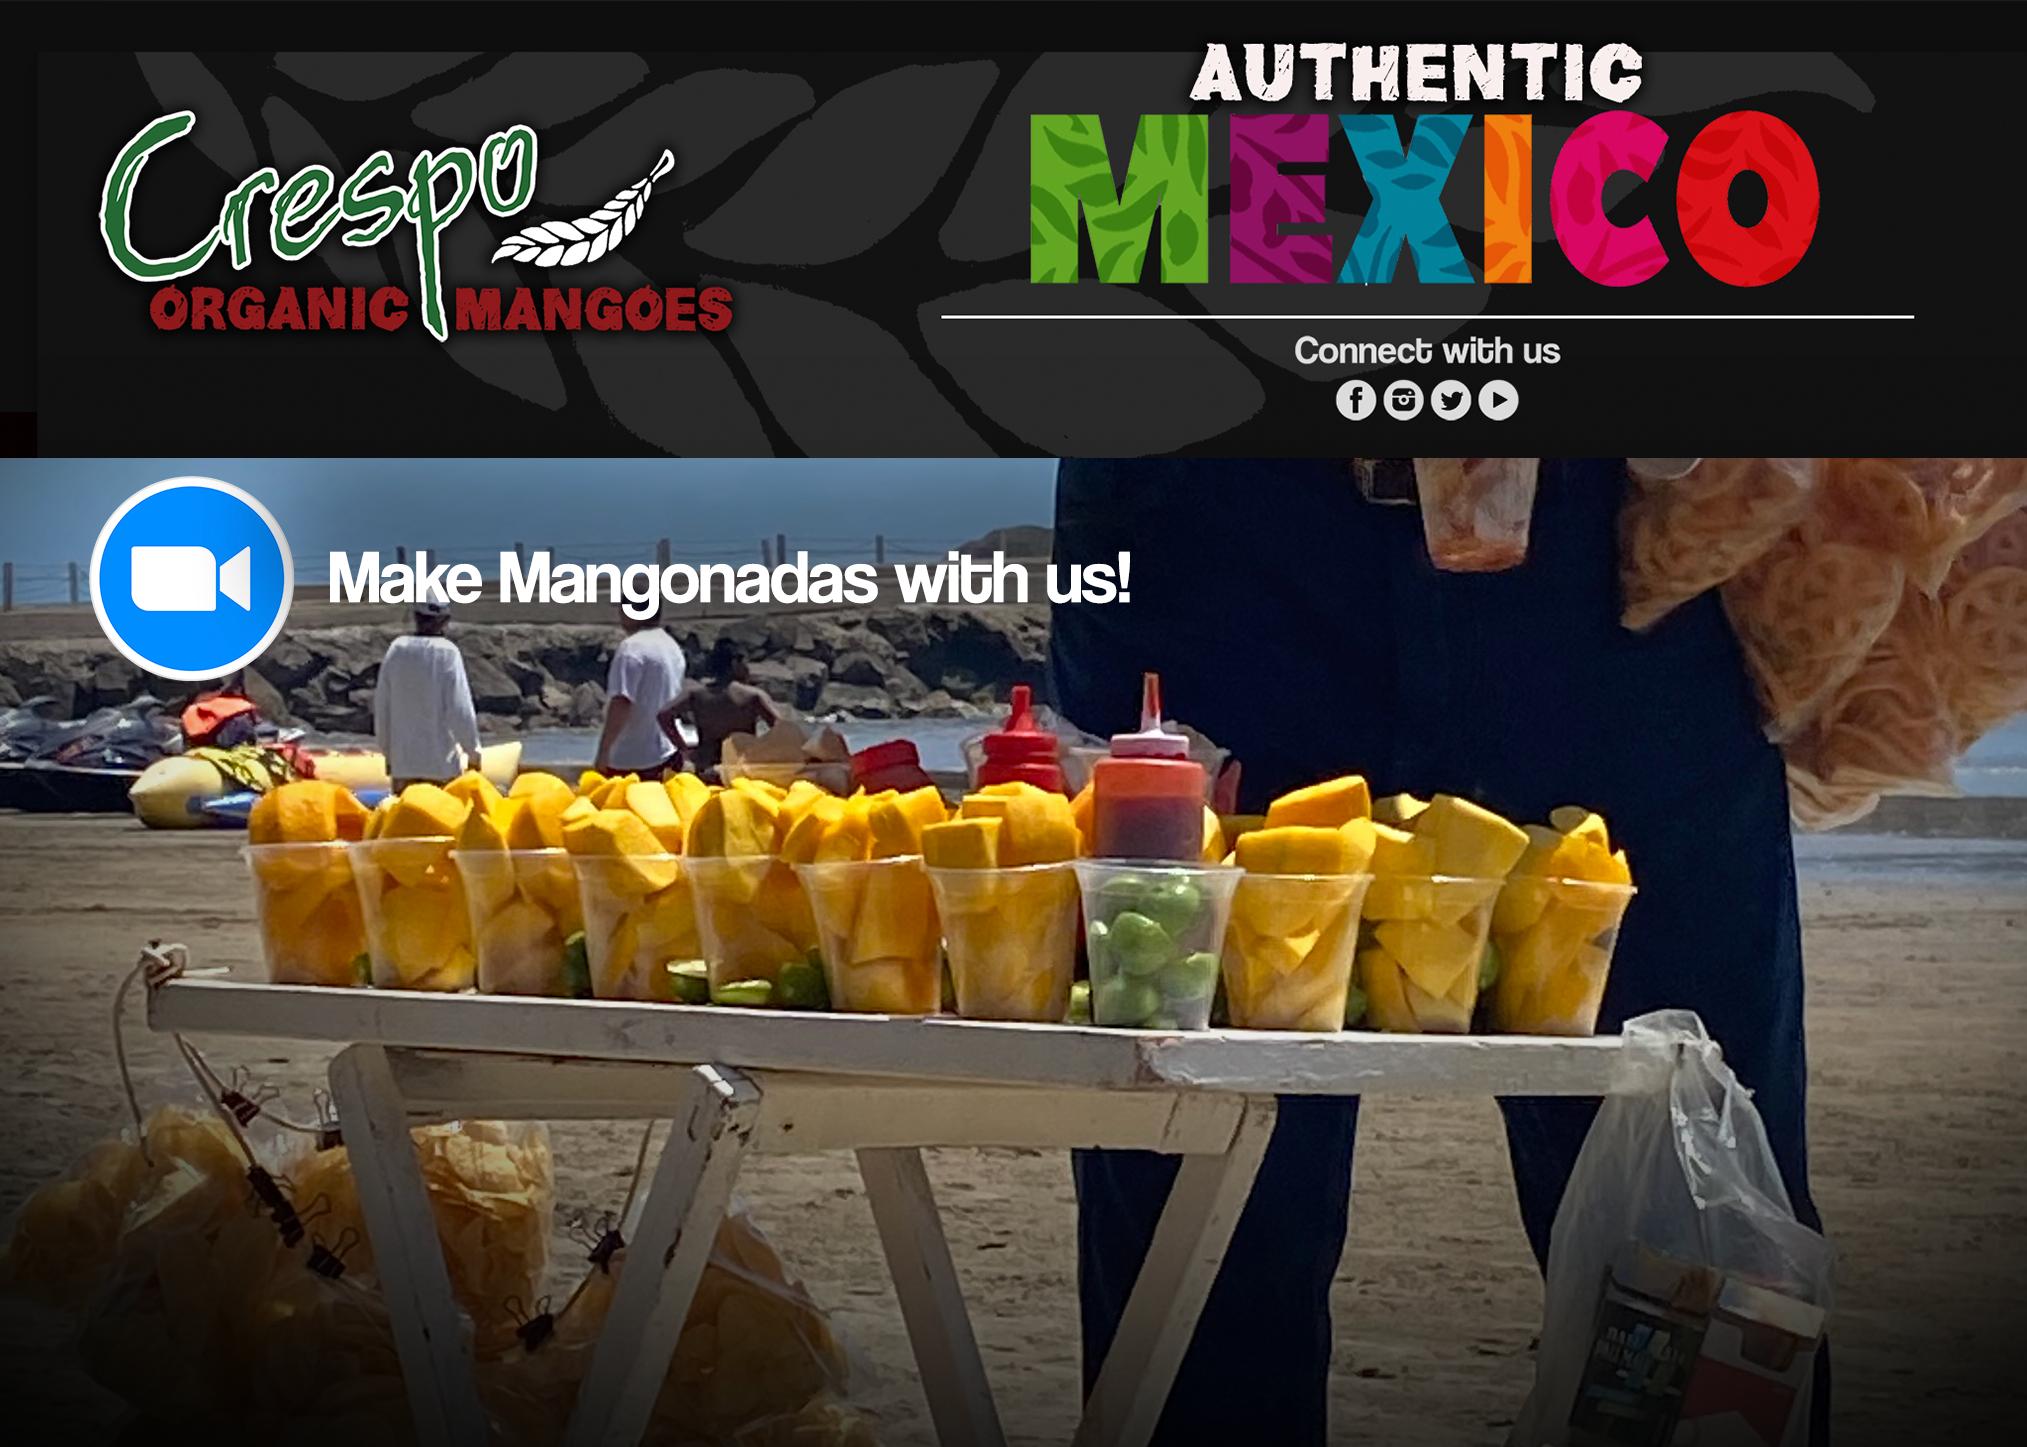 "<a class=""wonderplugin-gridgallery-posttitle-link"" href=""https://www.underthemangotree.crespoorganic.com/2021/06/26/authentic-mexico-mangonadas-from-scratch/"" target=""_blank"">Authentic Mexico, Mangonadas from Scratch</a>"